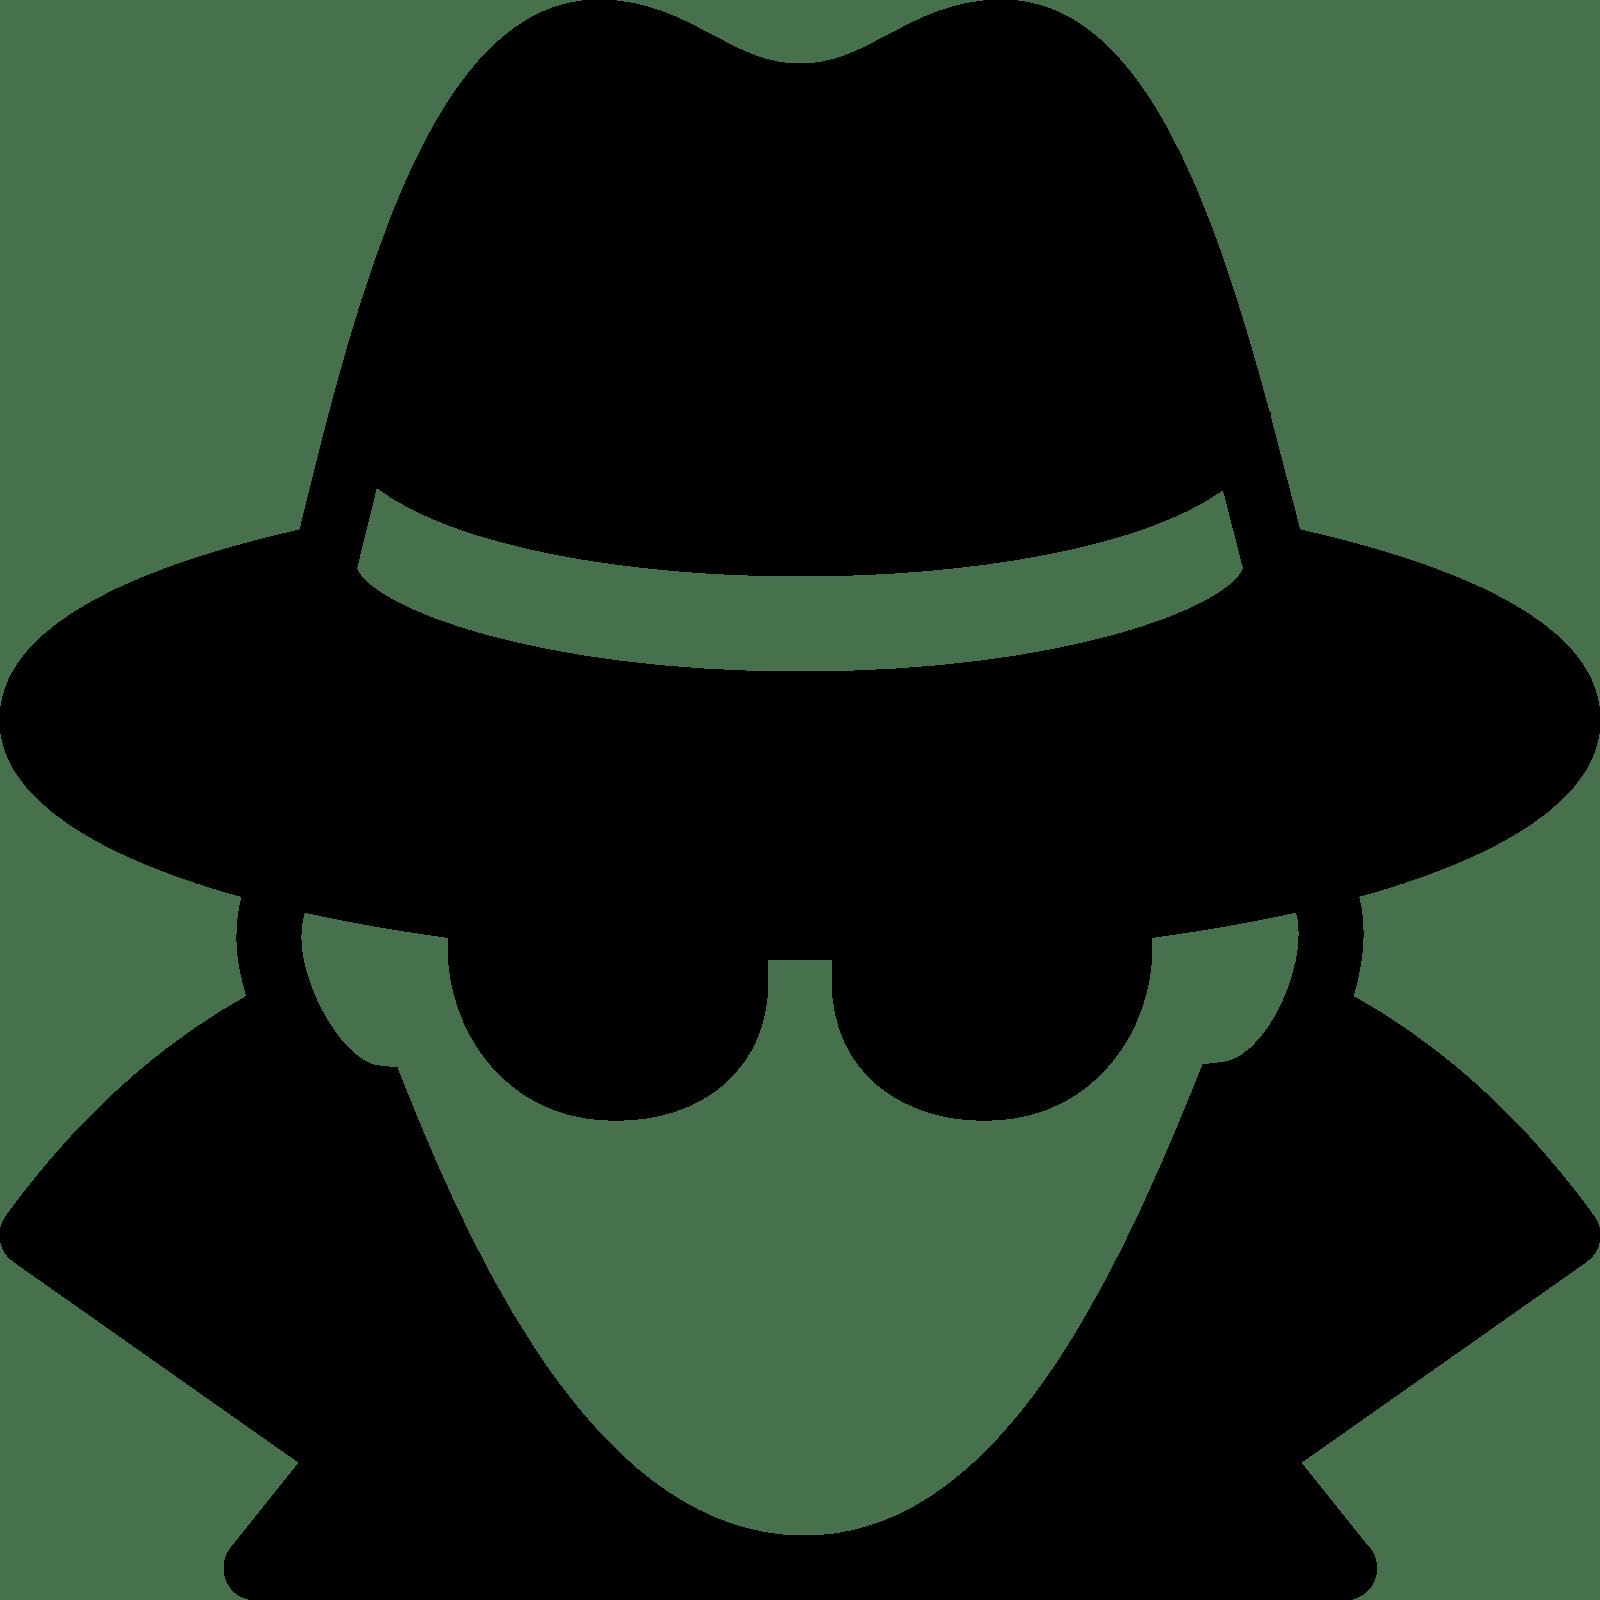 Library Of Super Spy Svg Transparent Download Files